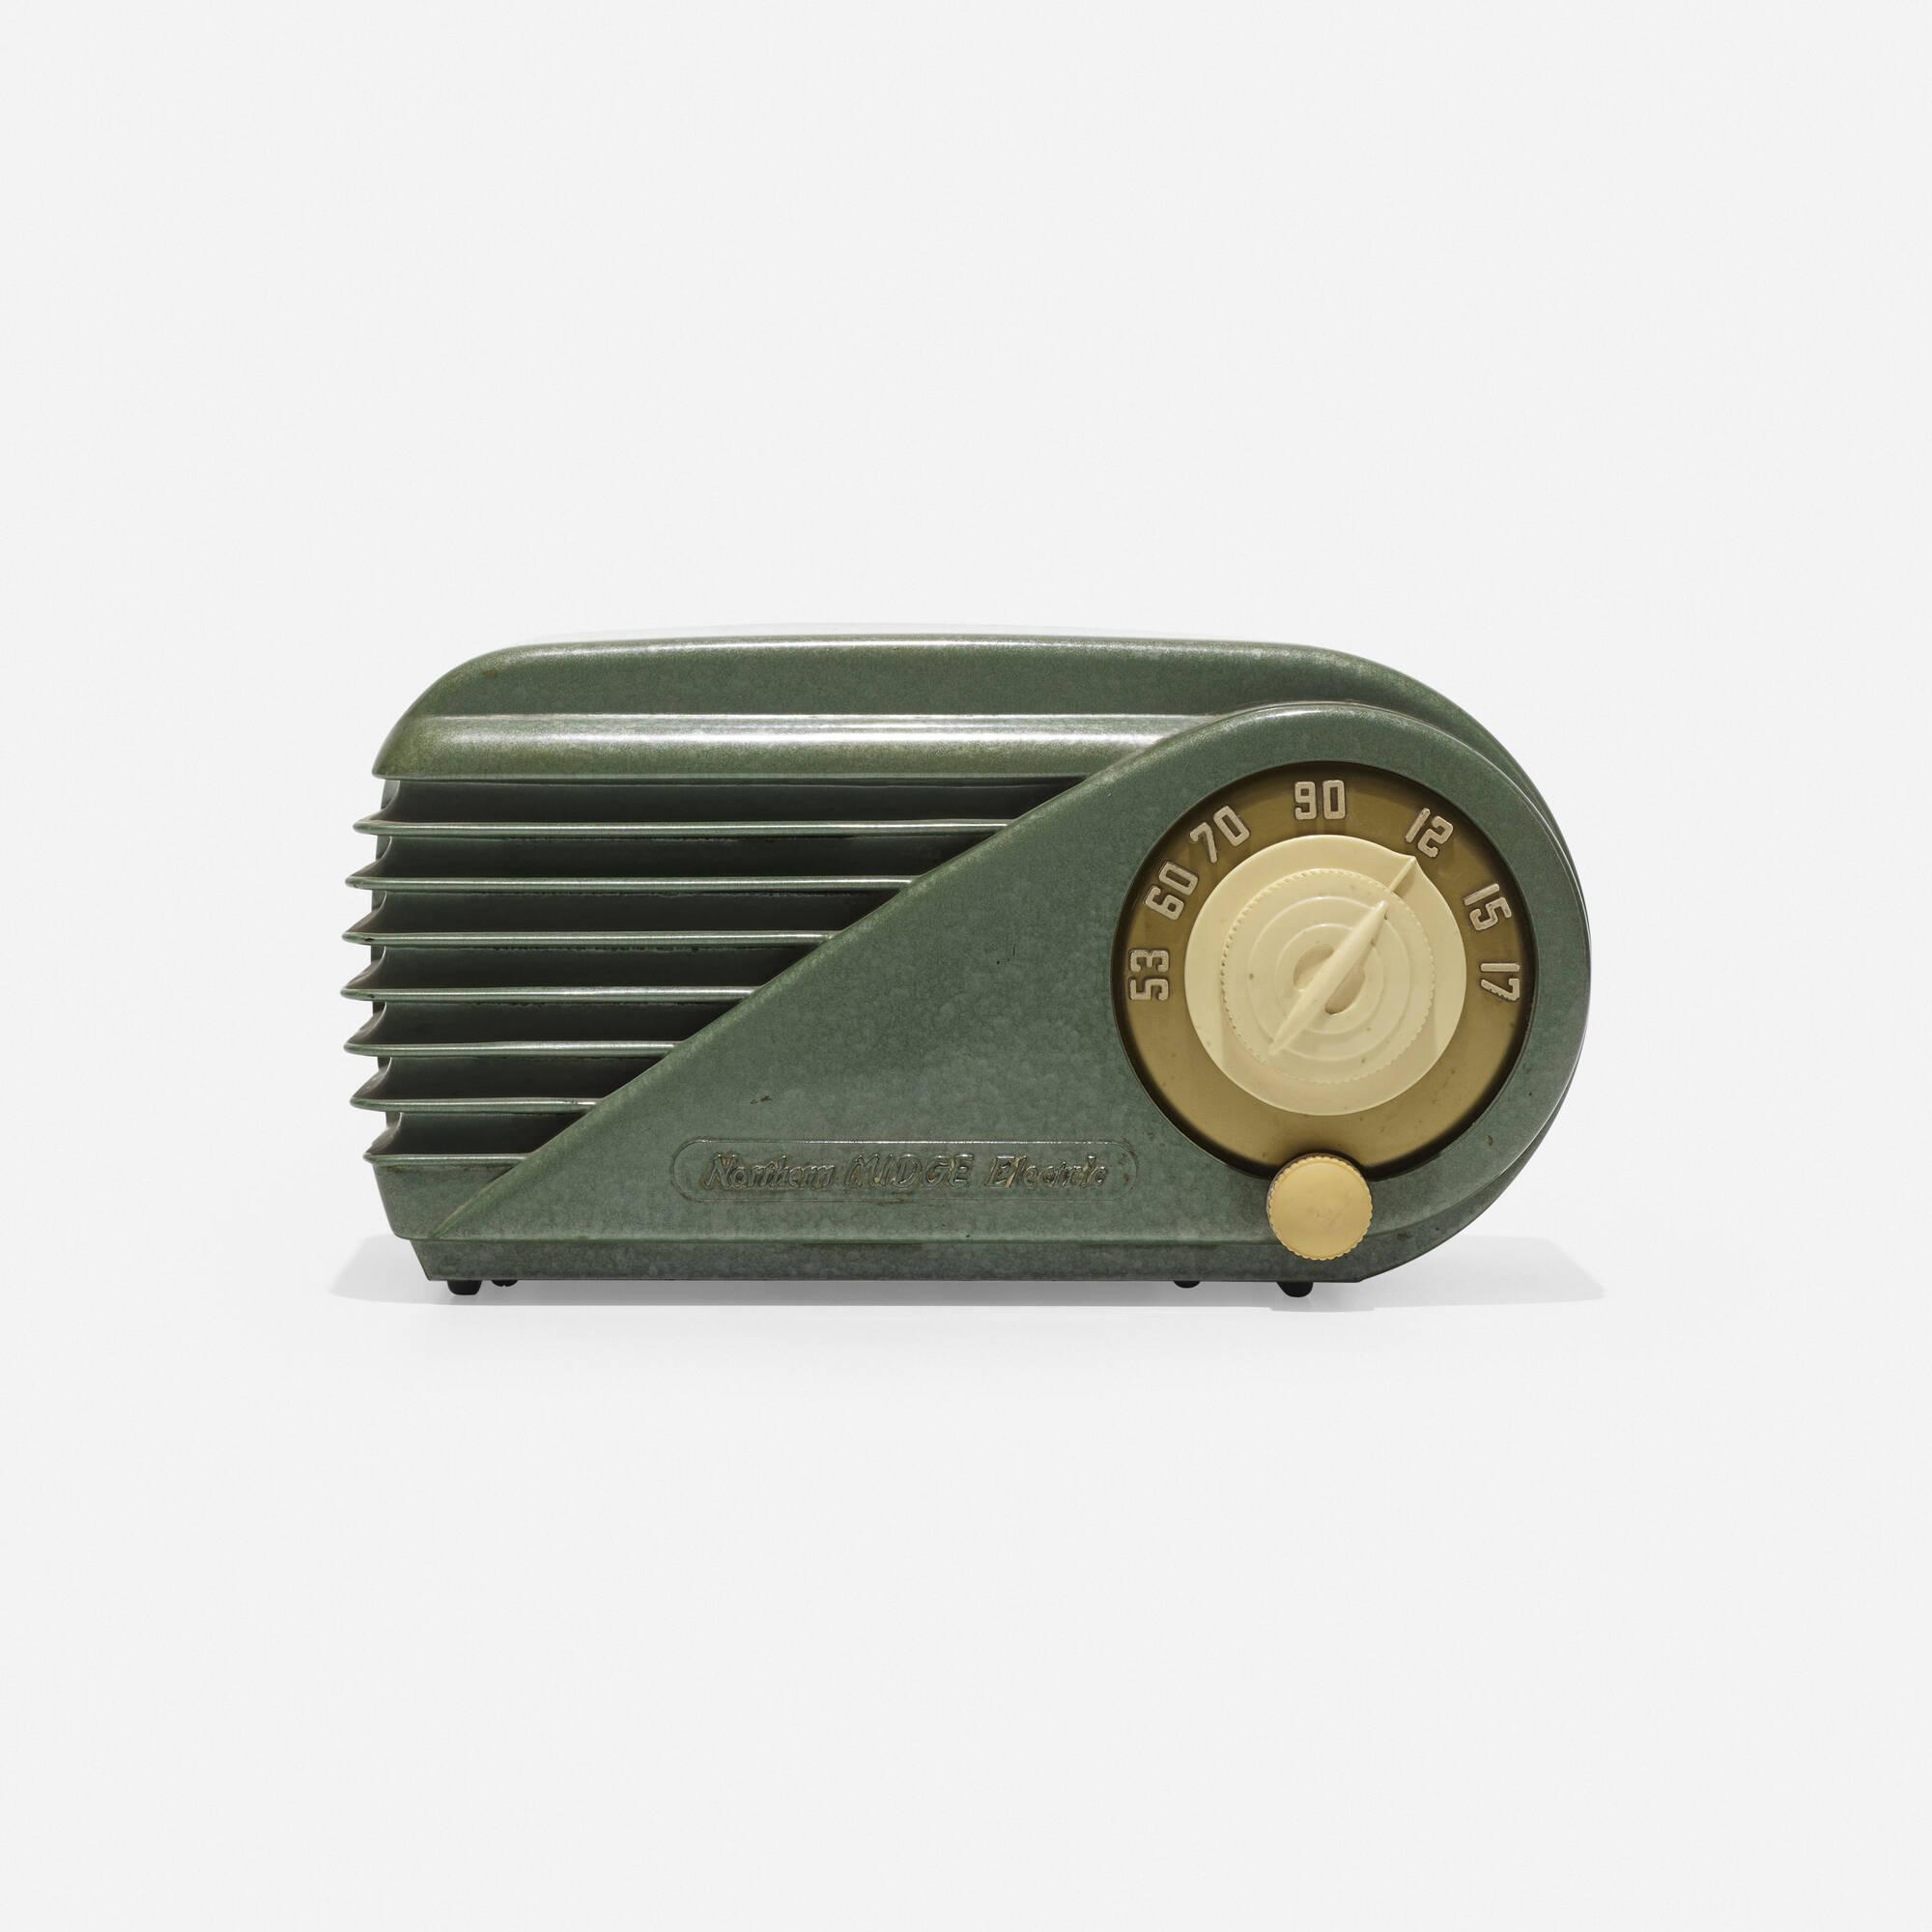 192: Northern Electric / Midge radio, model 5508 (2 of 3)